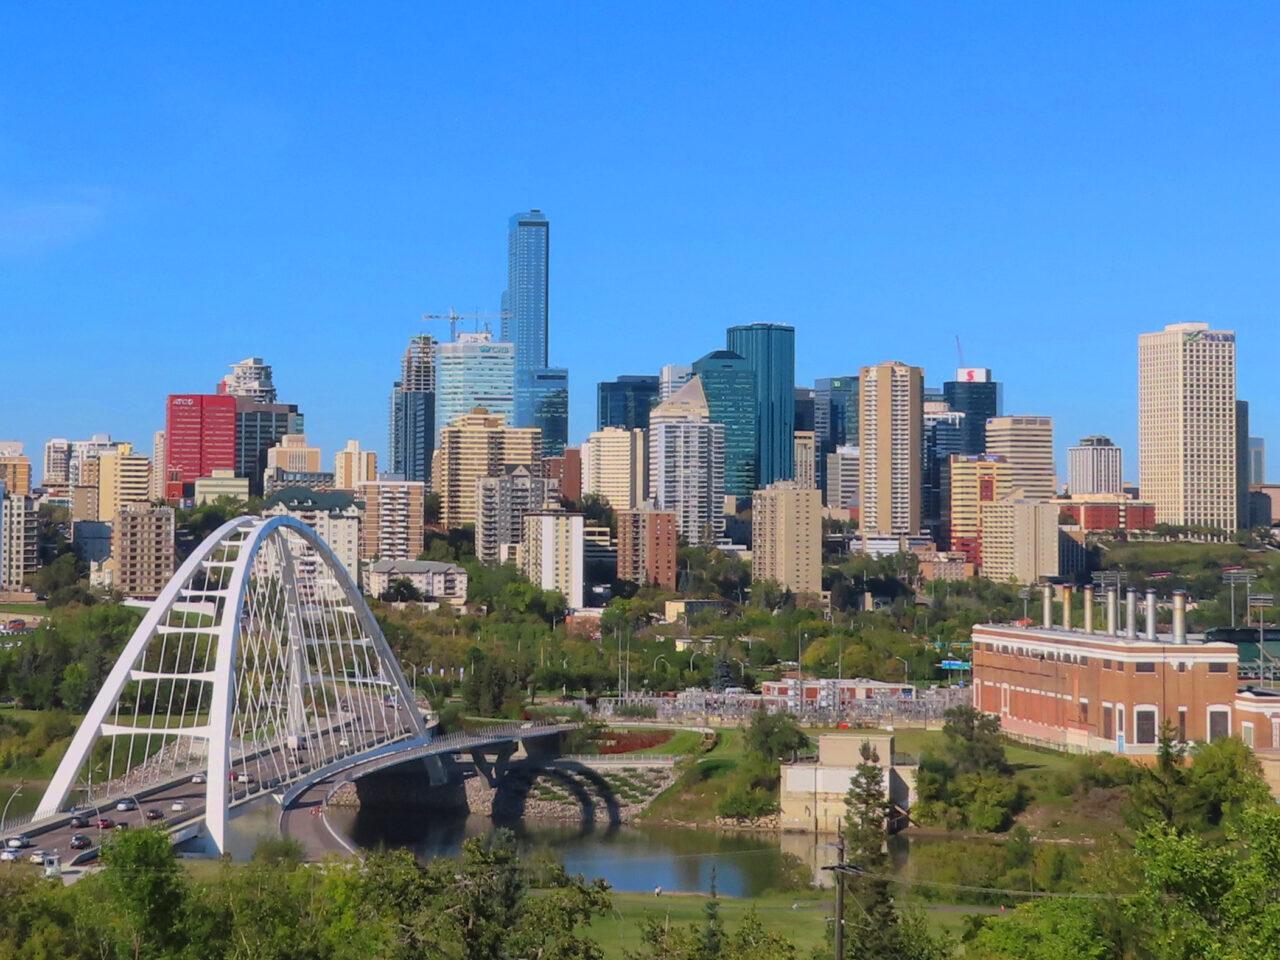 https://mk0mosaichomesep04mv.kinstacdn.com/wp-content/uploads/2021/06/Edmonton-Skyline-1280x960.jpg